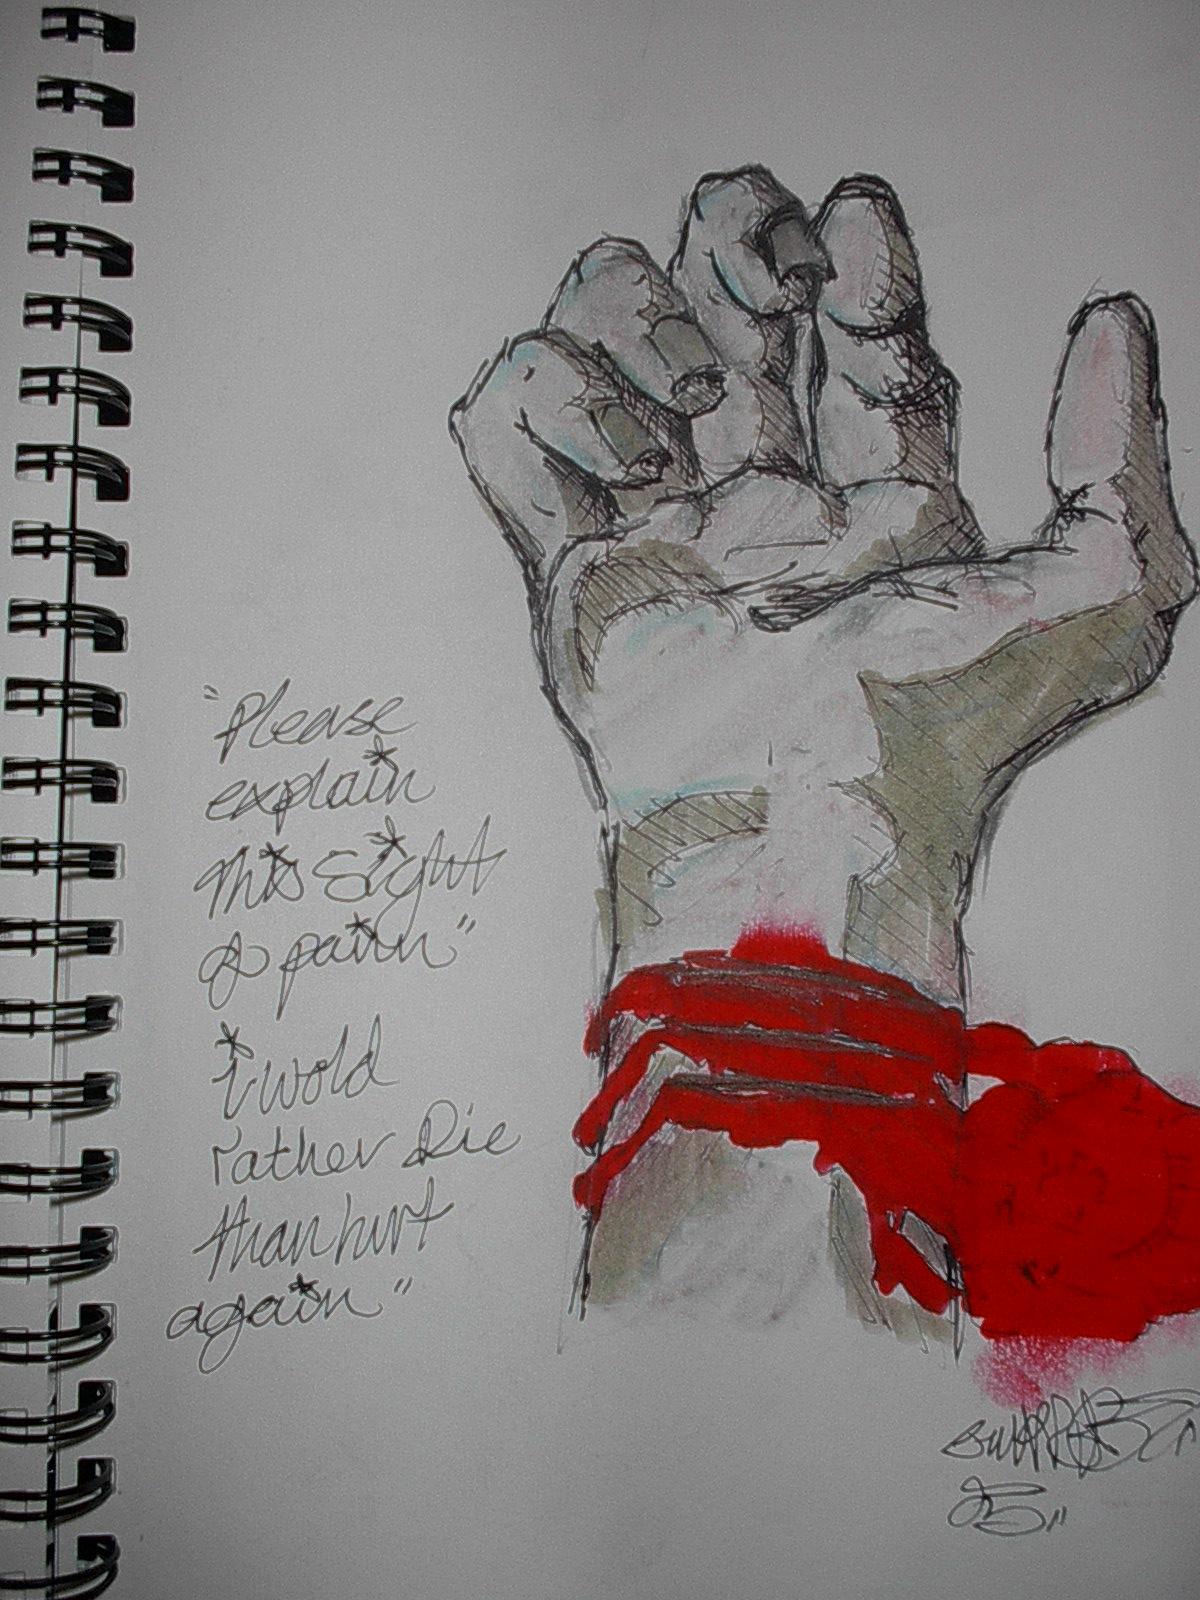 slit wrist by empra666 on DeviantArt